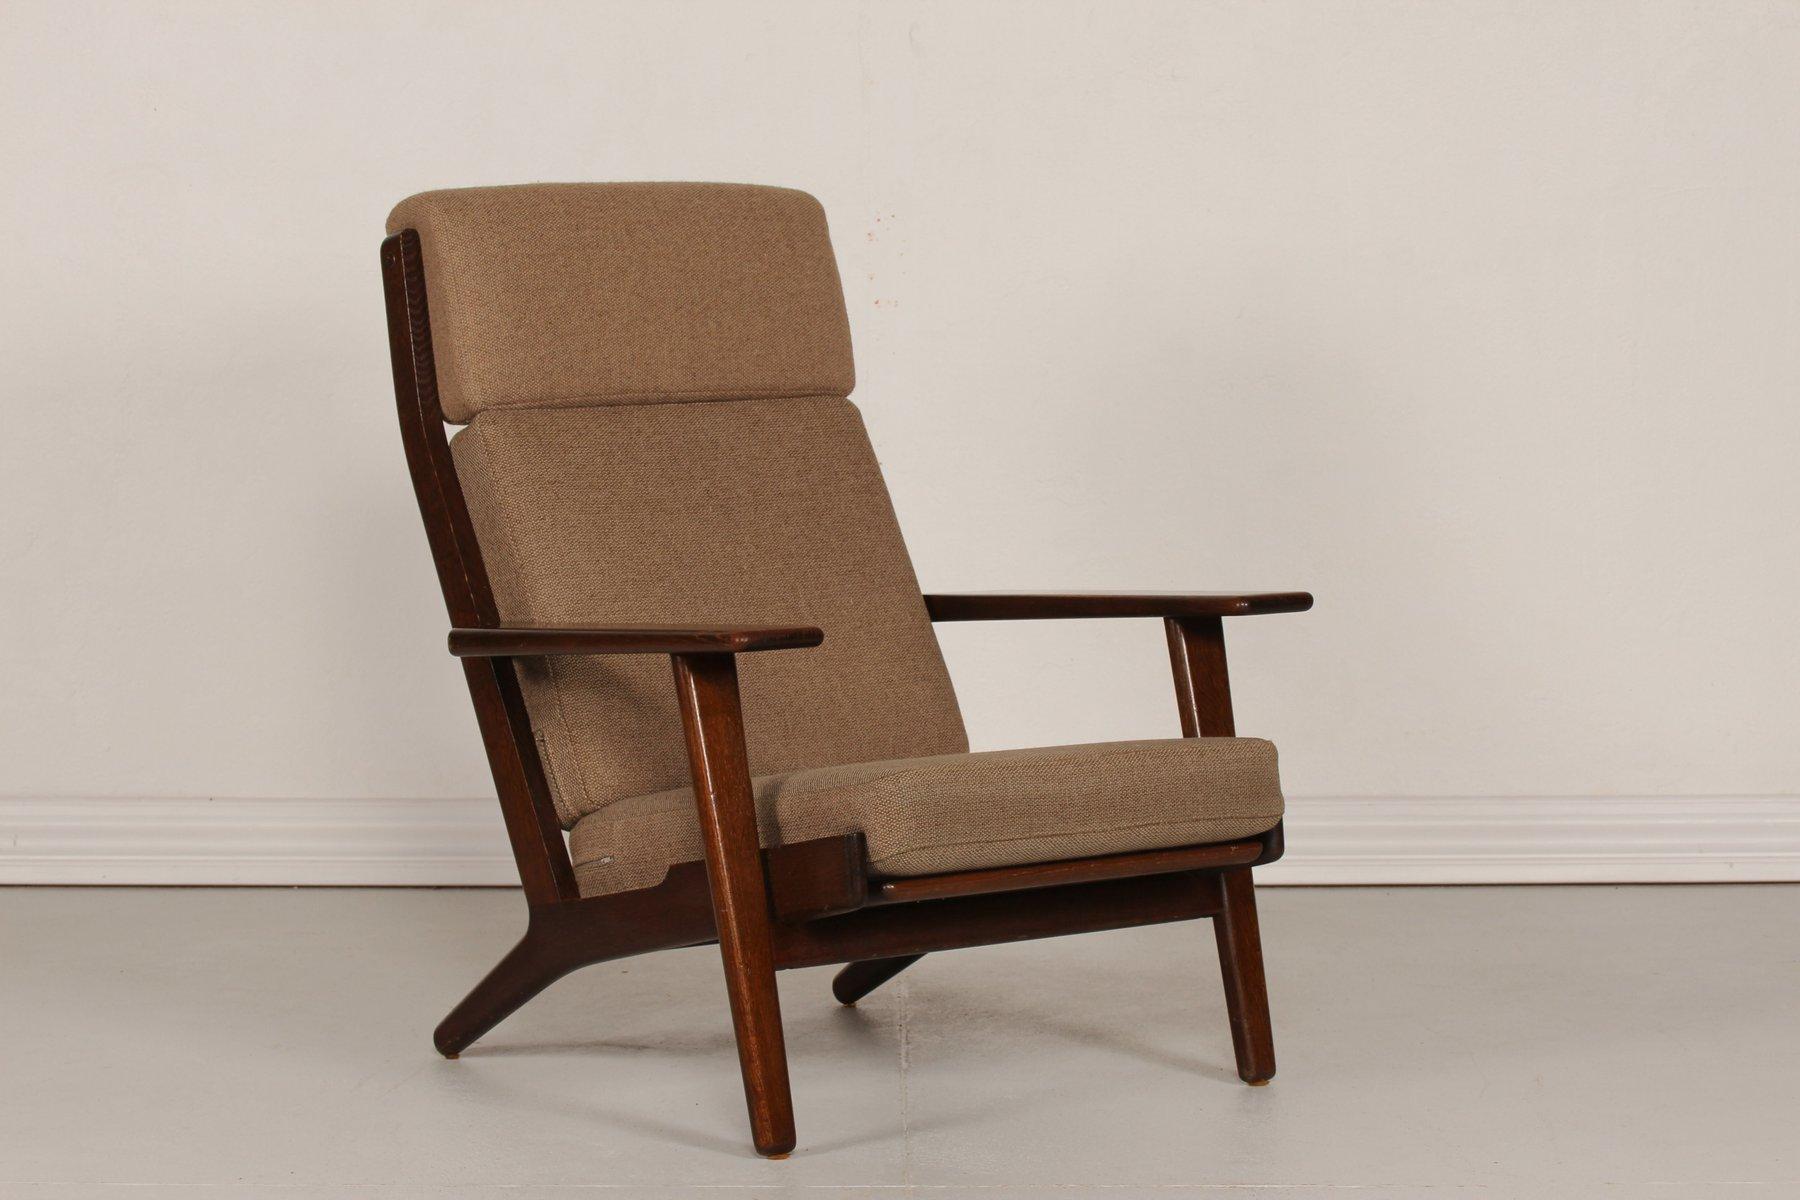 GE 290 High-Back Oak Chair by Hans J. Wegner for Getama, 1970s